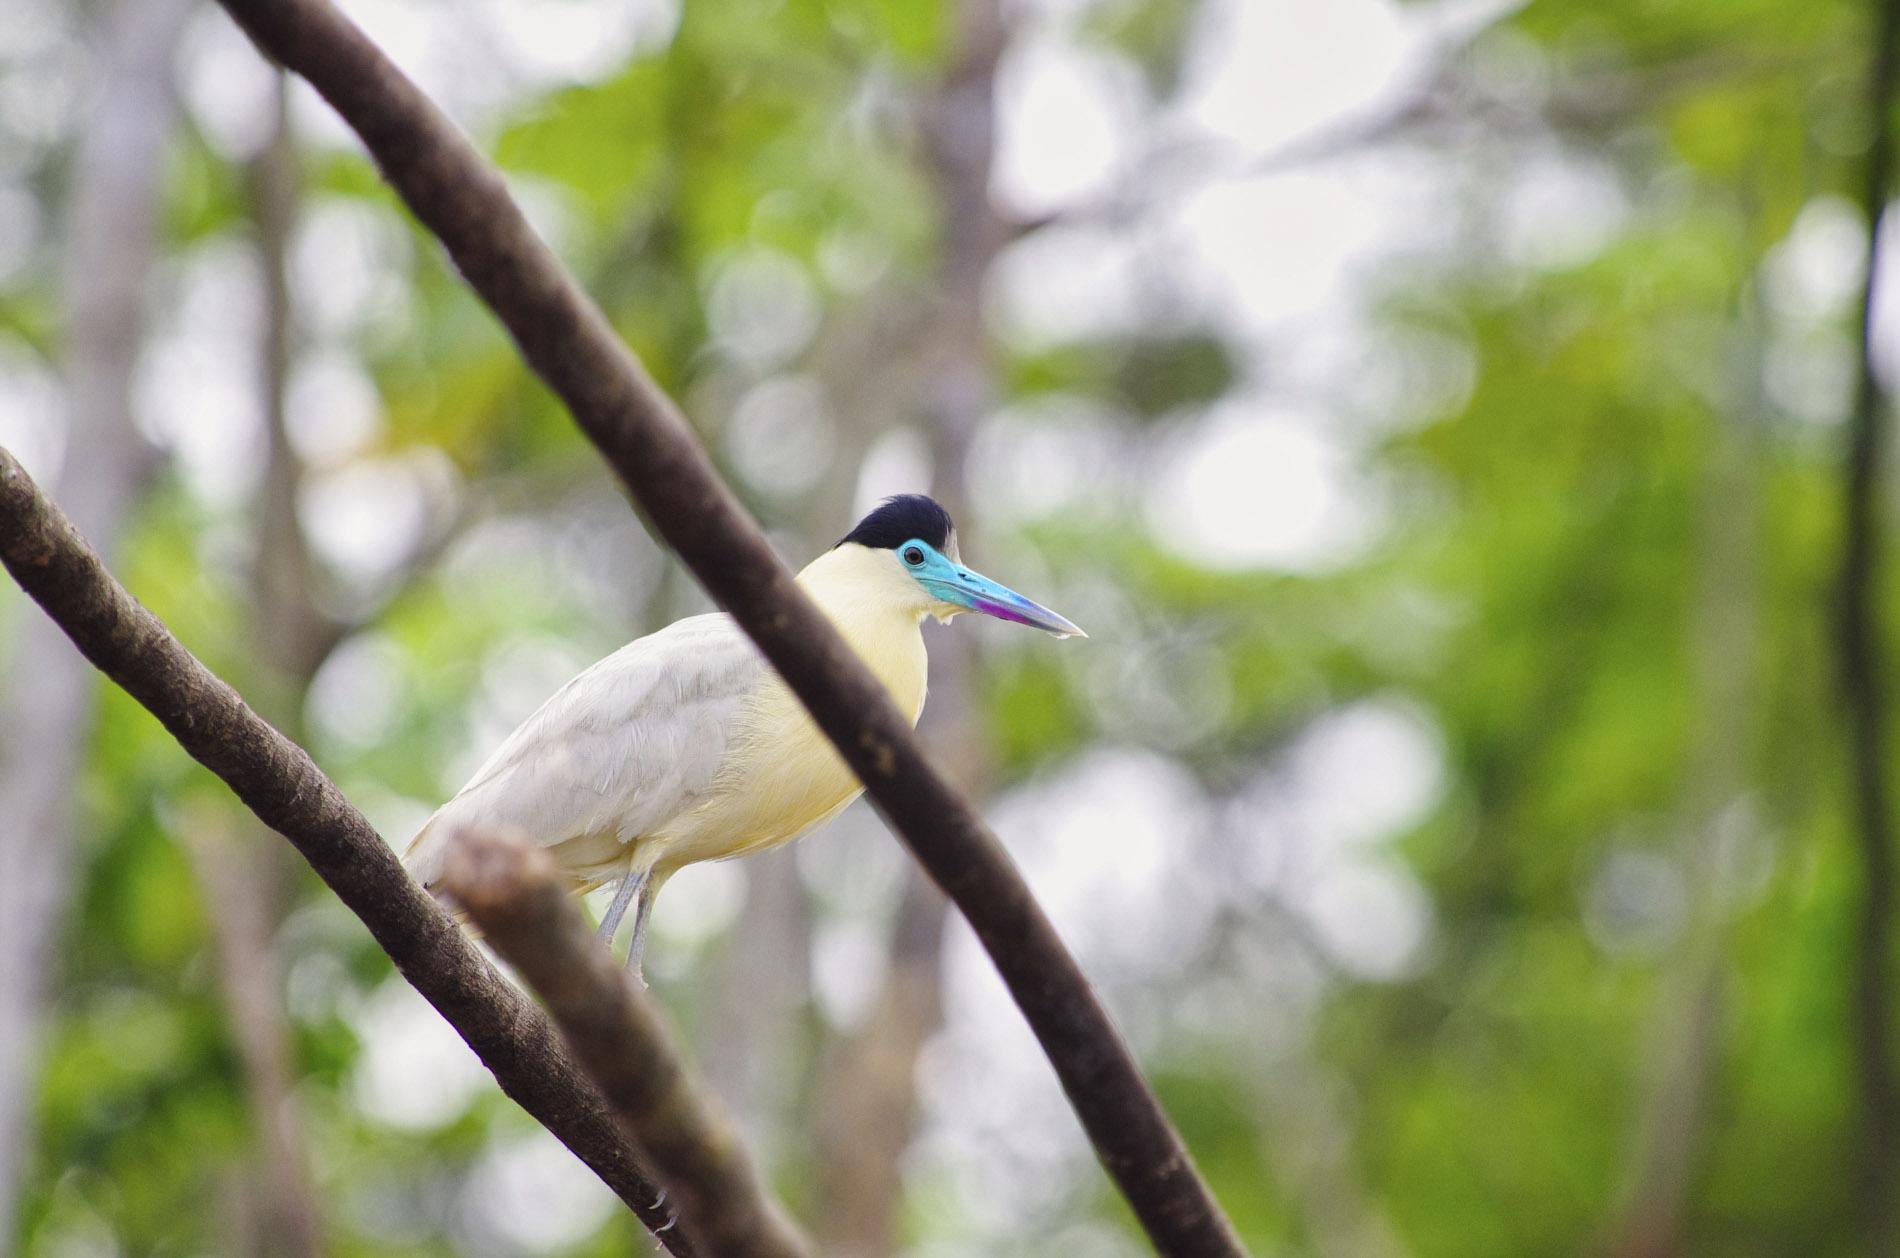 Black-Capped-Heron - Amazonas-Peru